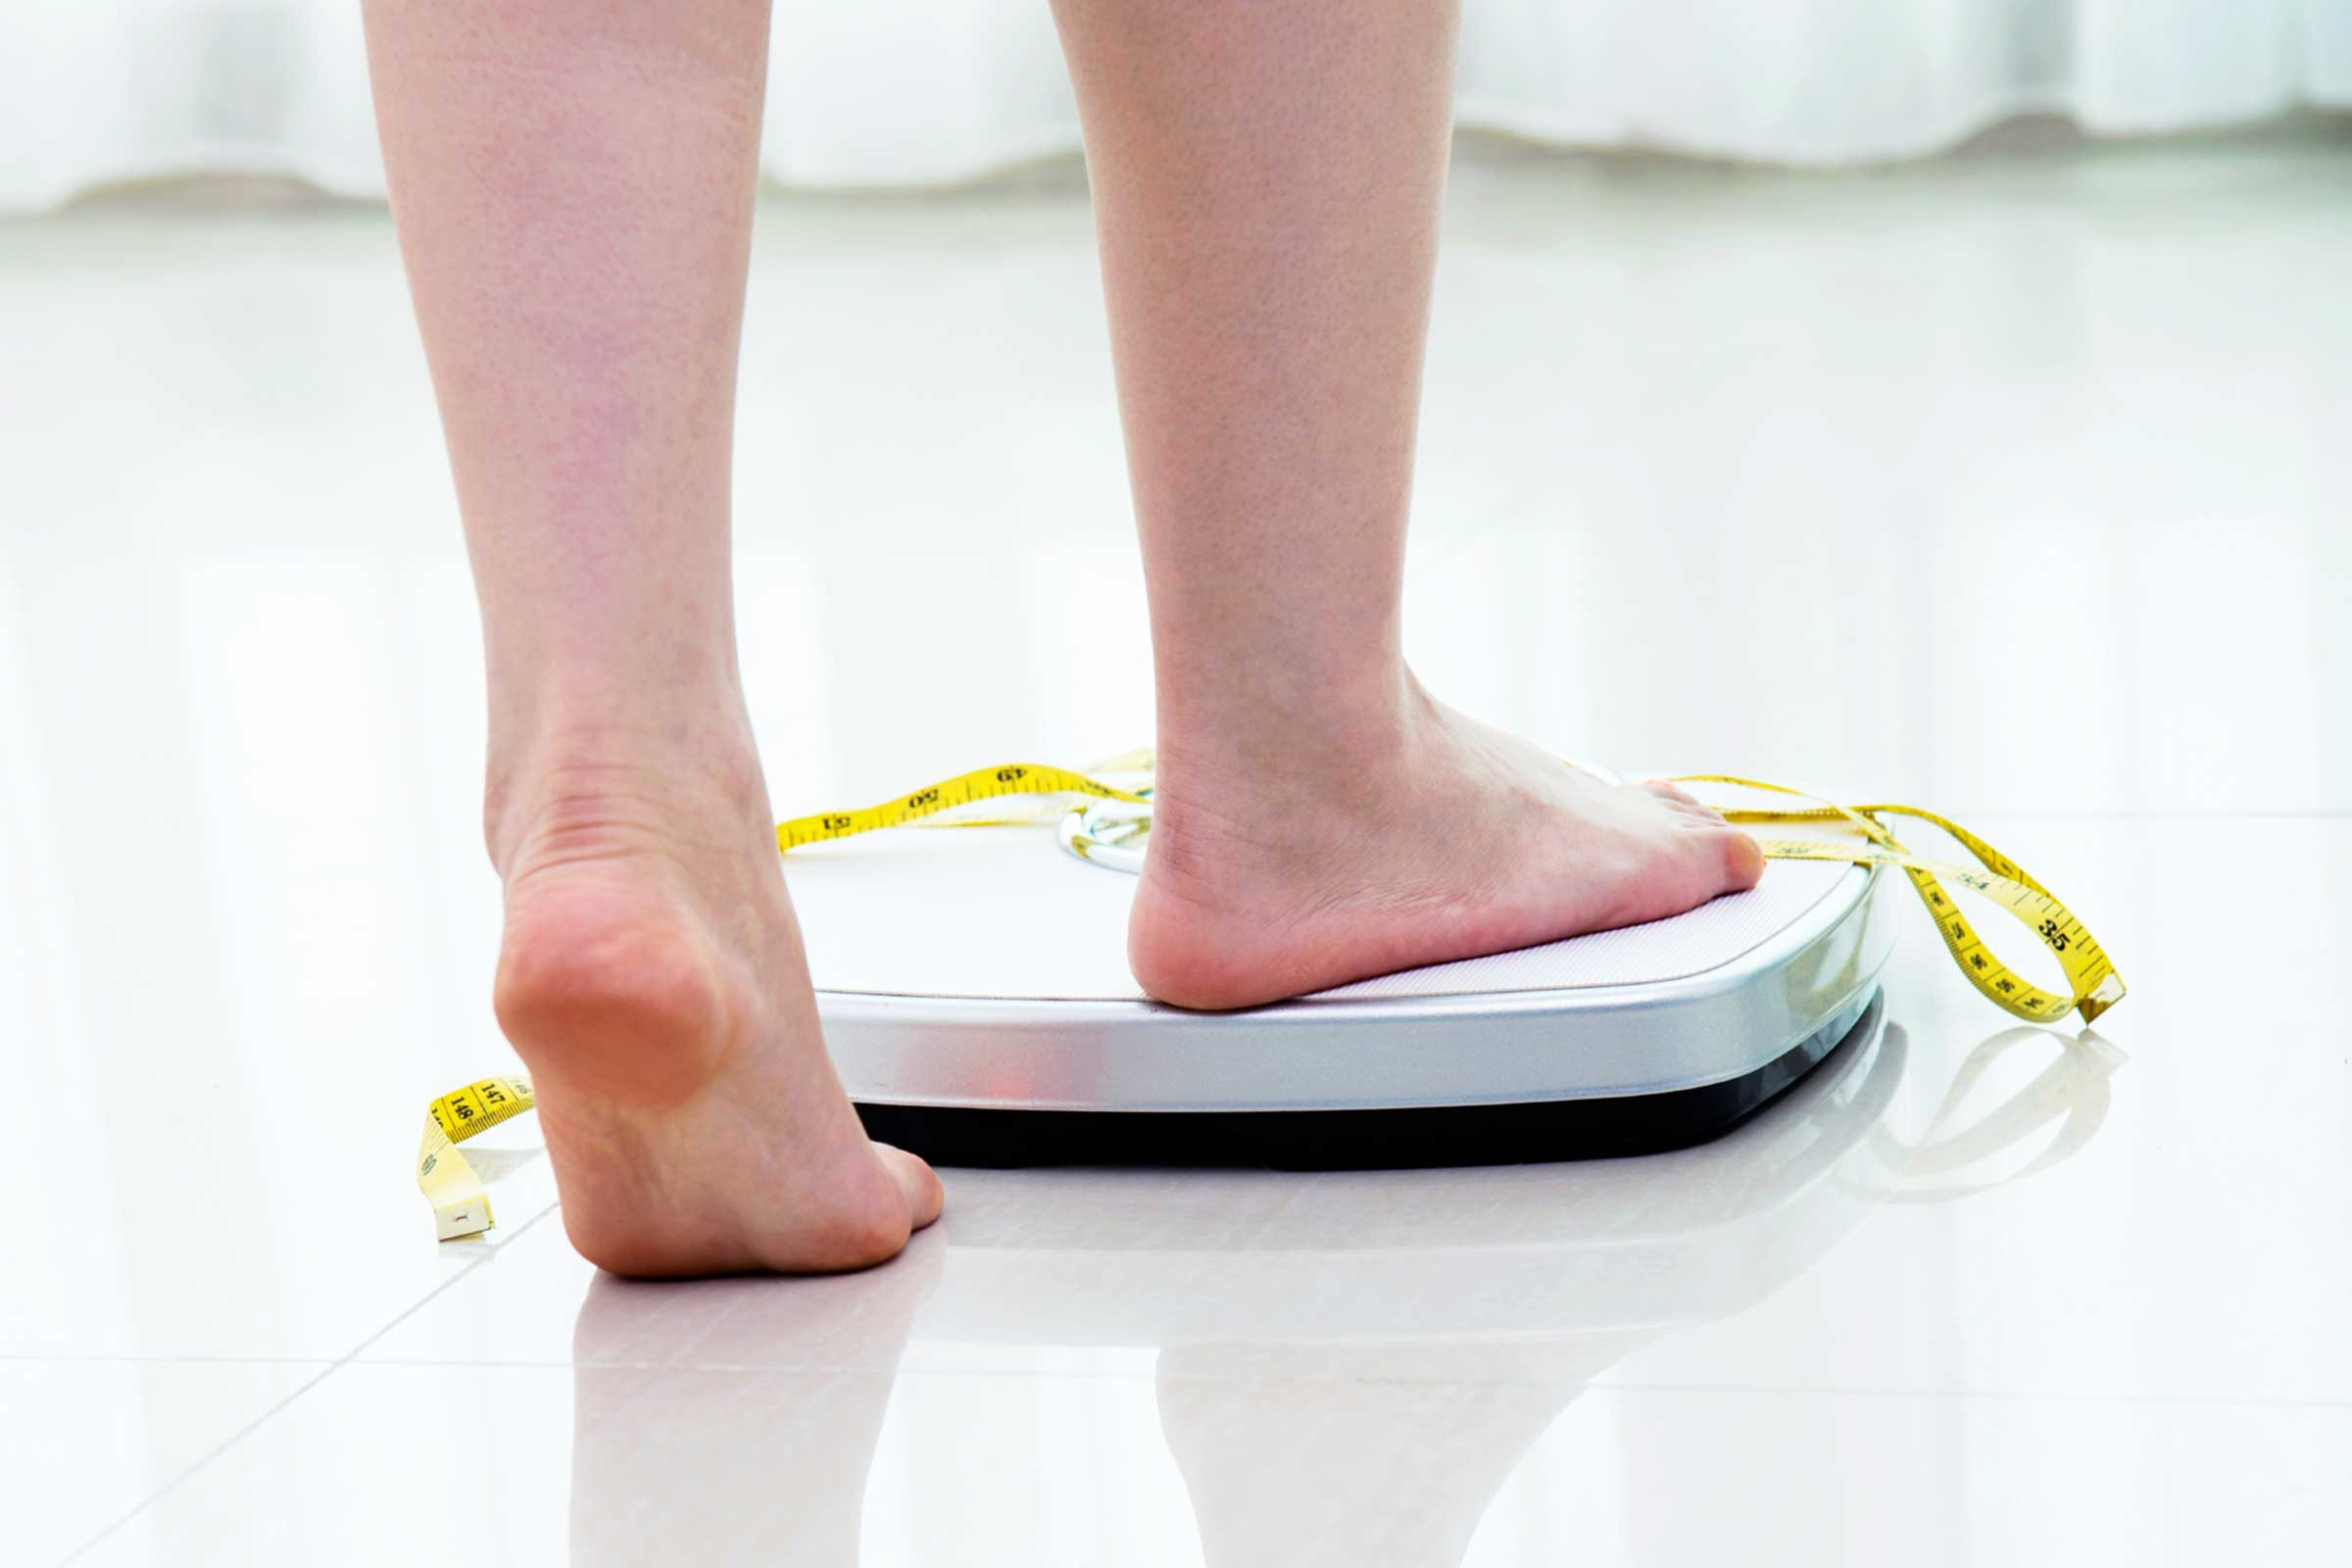 signes-manque-proteine-probleme-perdre-poids